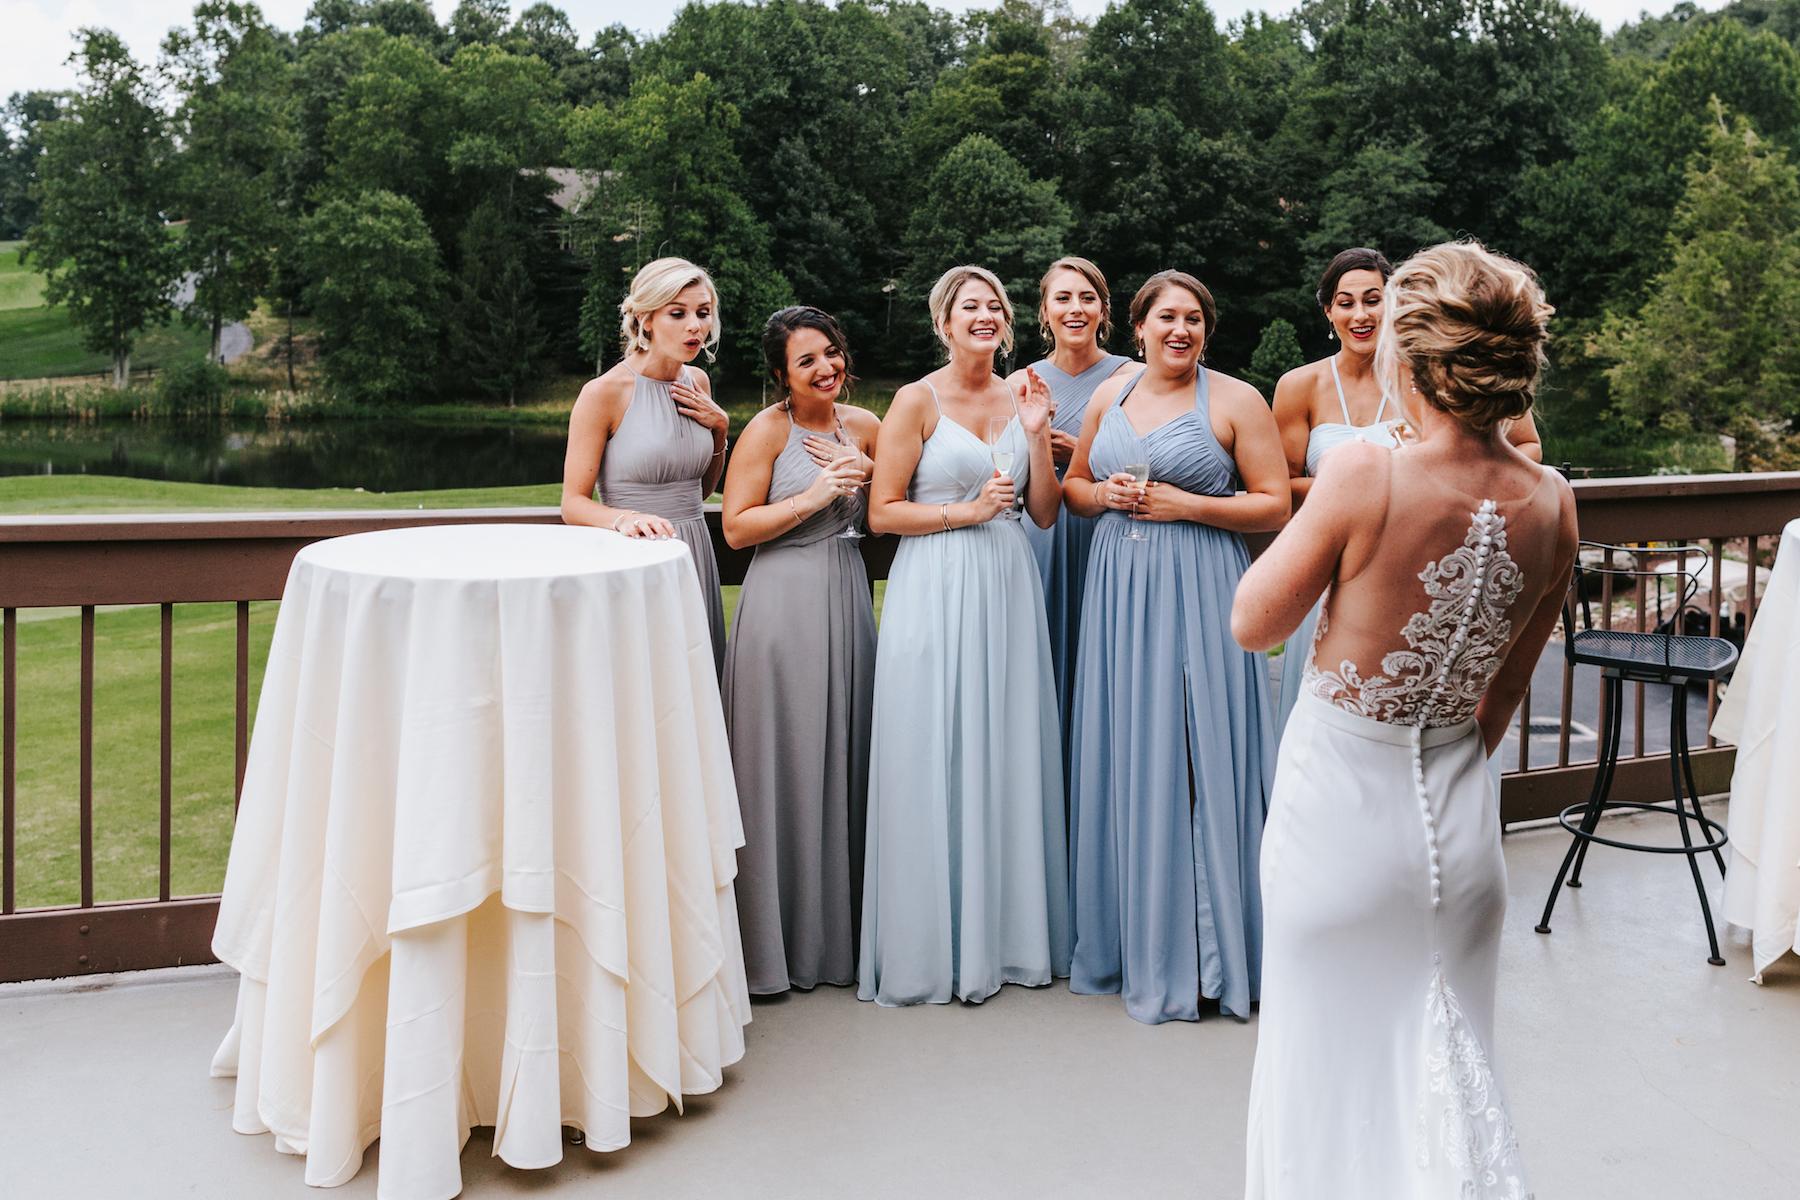 wedding-engagement-photographer-spartanburg-greenville-columbia-carolina-south-north-459.JPG